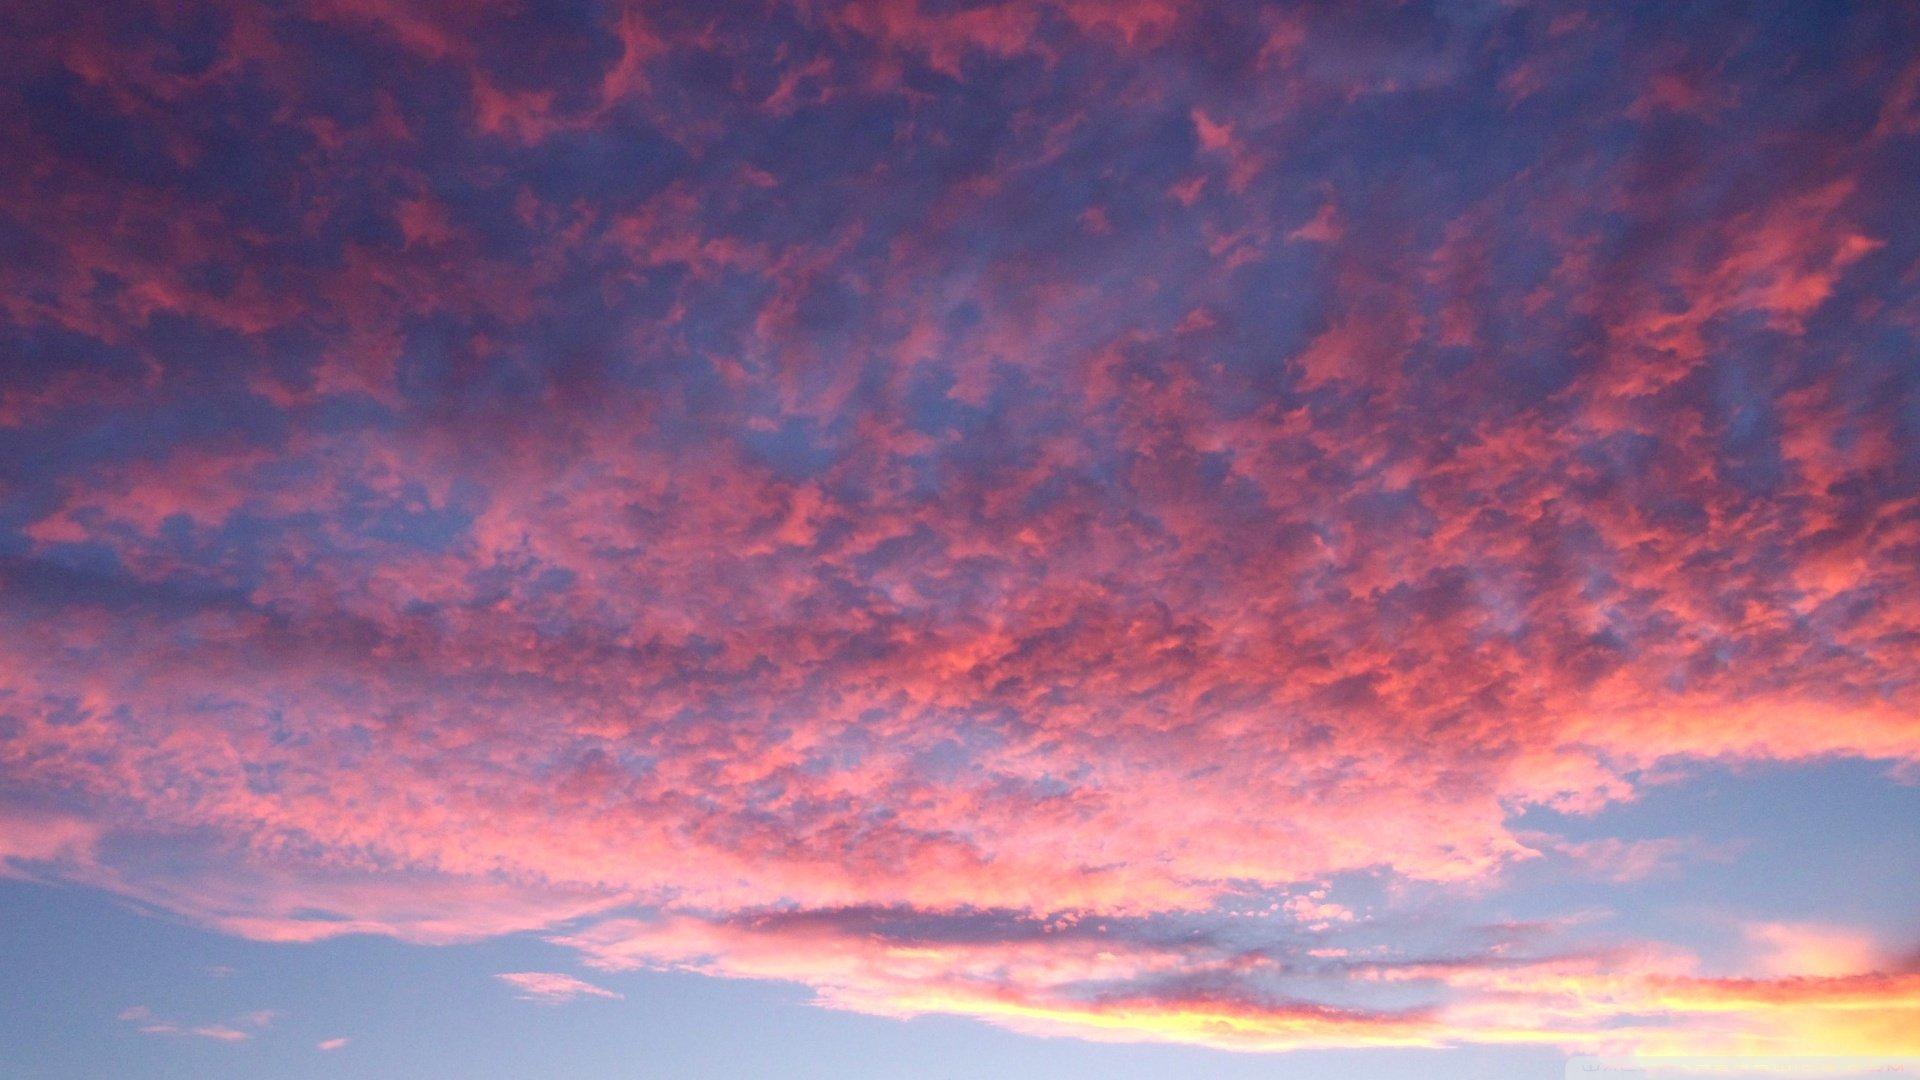 Pink Sky Image